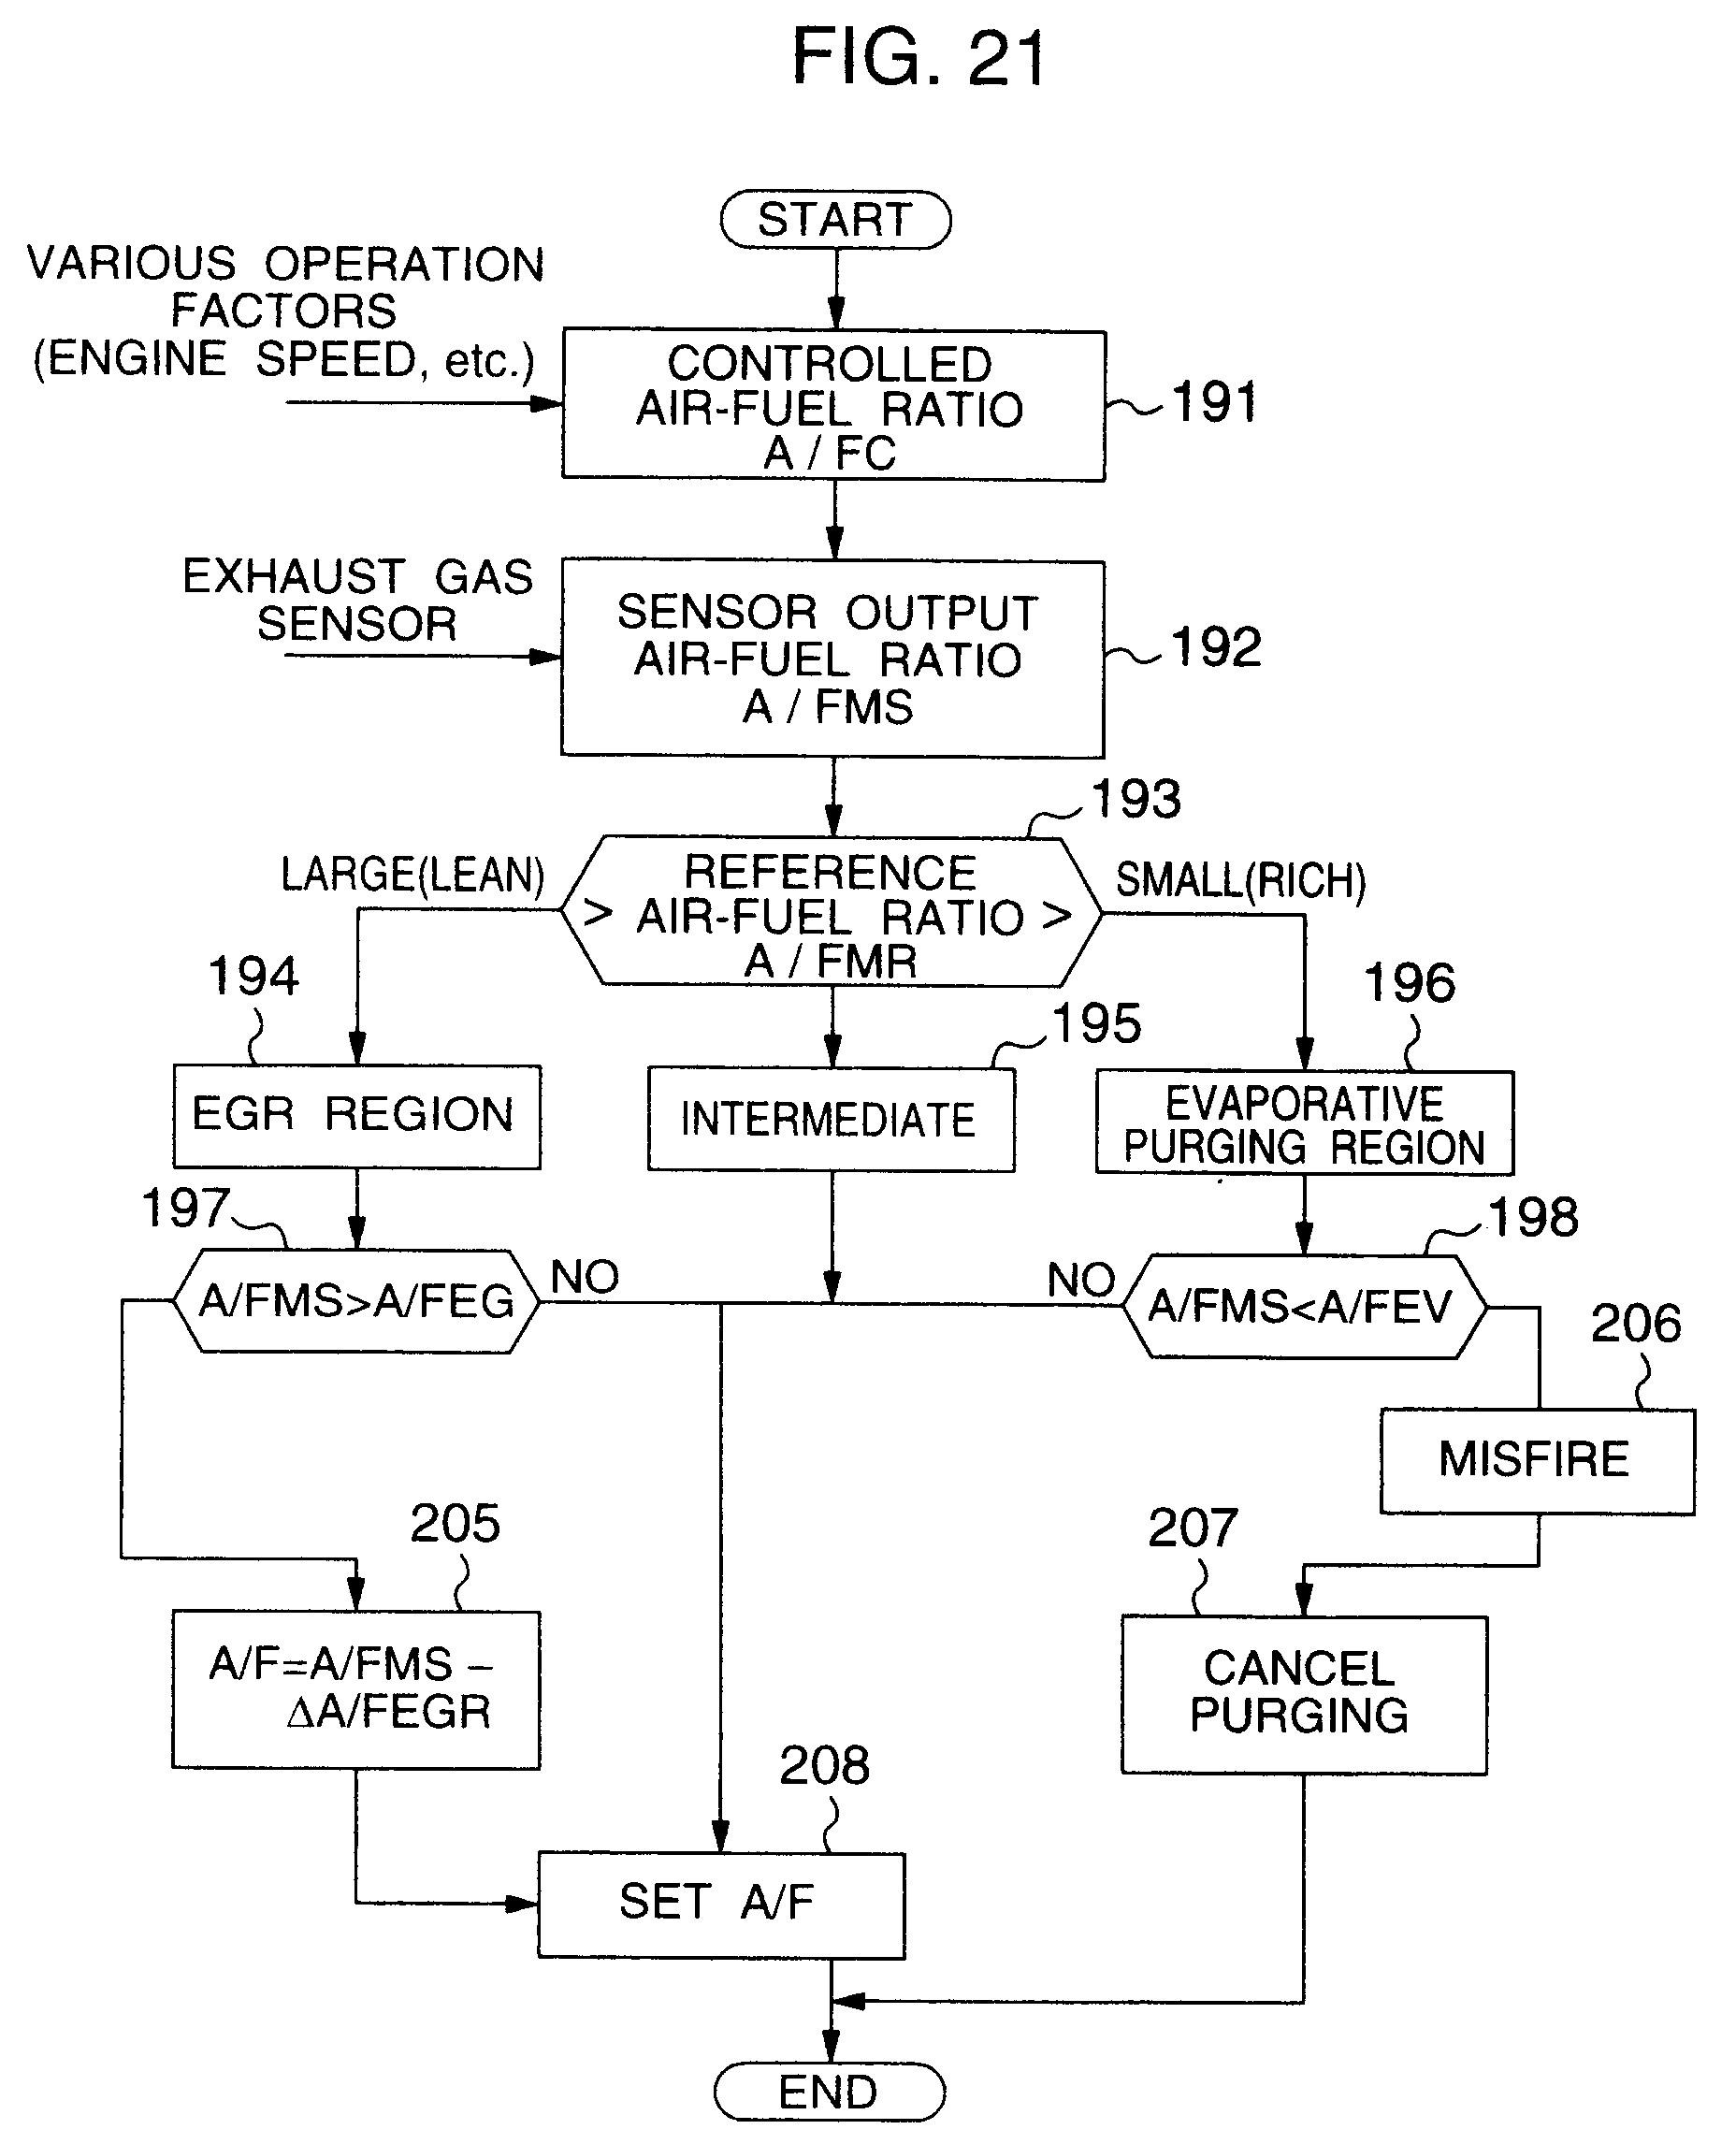 Lean Burn Engine Diagram Patent Ep A2 Control Apparatus for Use In Internal Of Lean Burn Engine Diagram